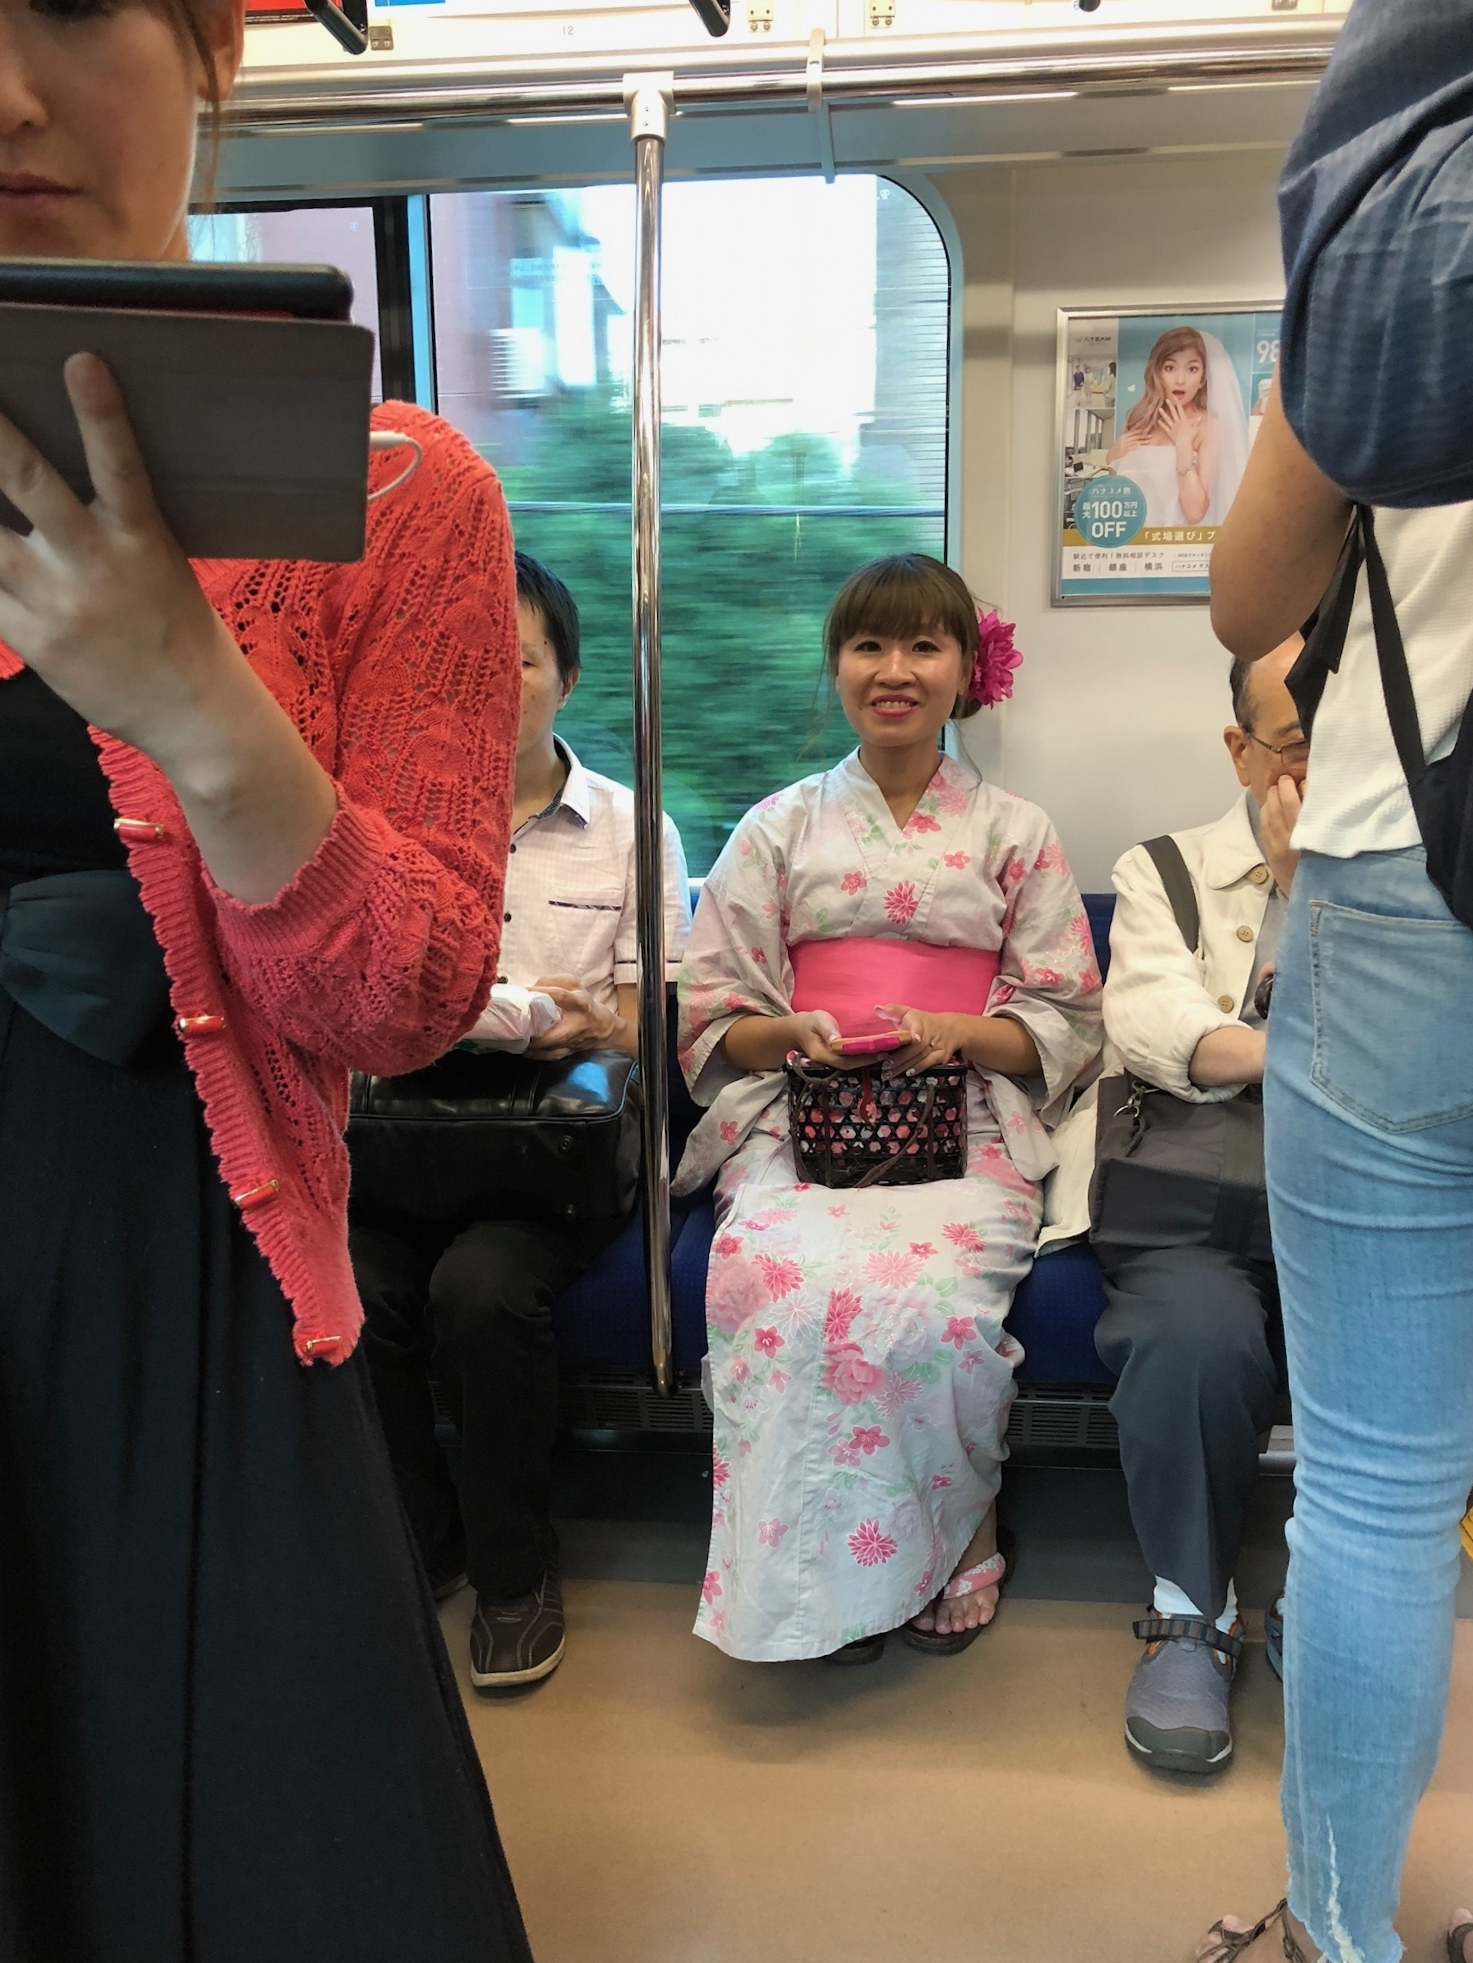 On the train to the omatsuri in Tsurumi, a ward in Yokohama.